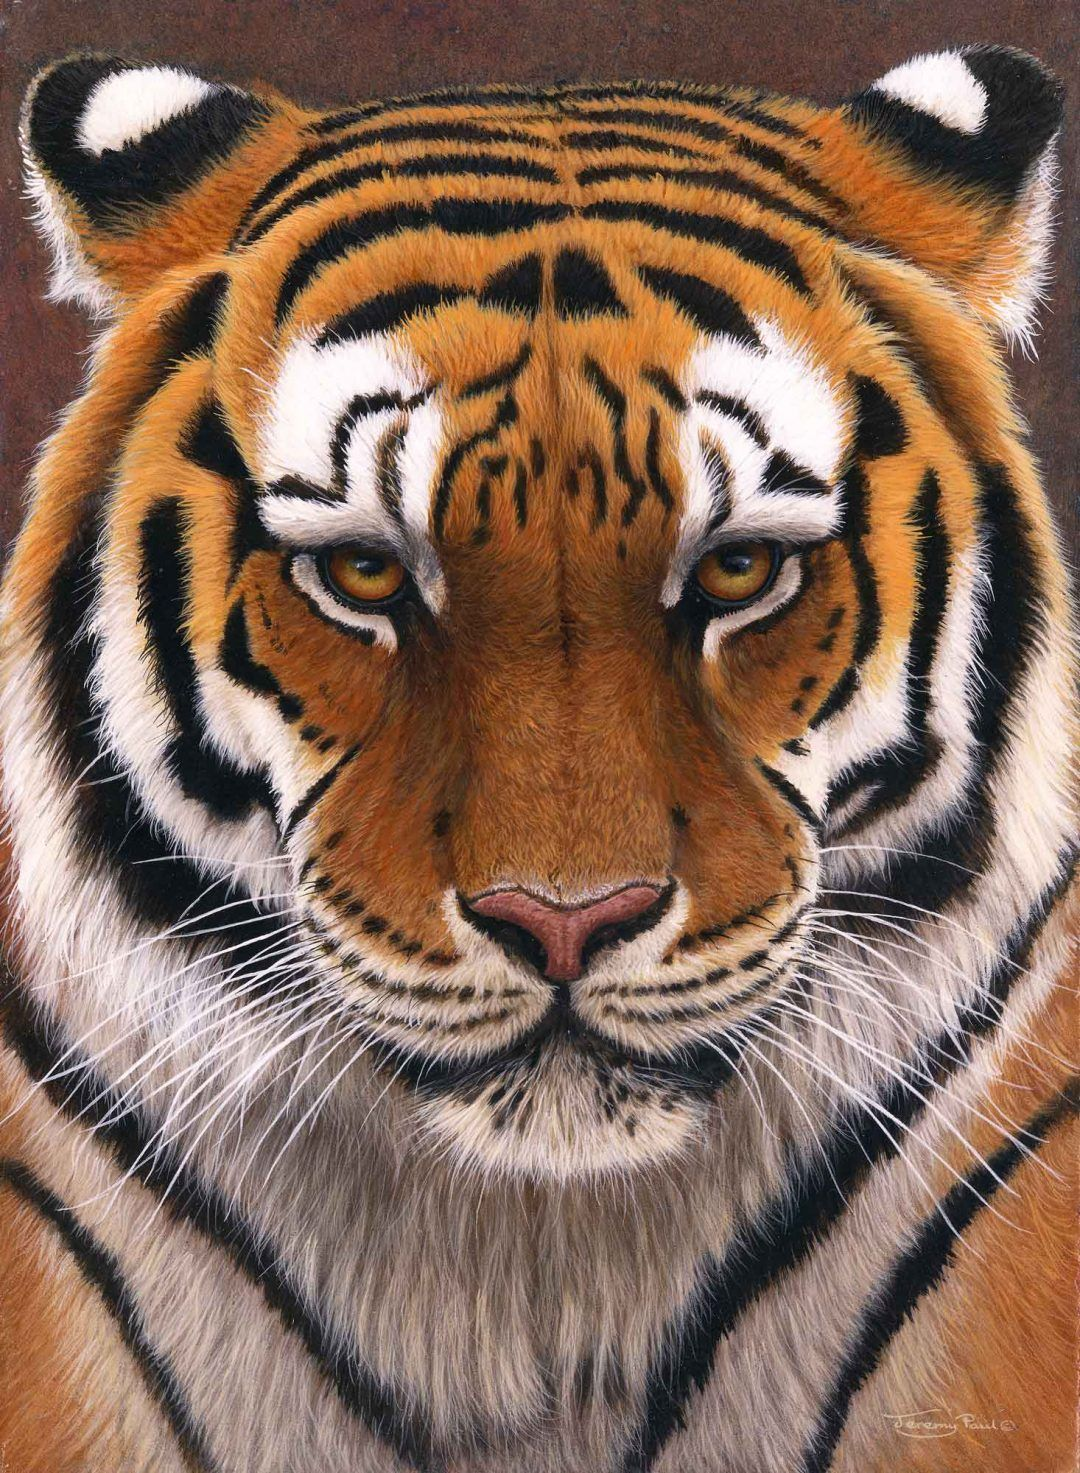 JP81 'Intense' Siberian Tiger in 2020 Siberian tiger